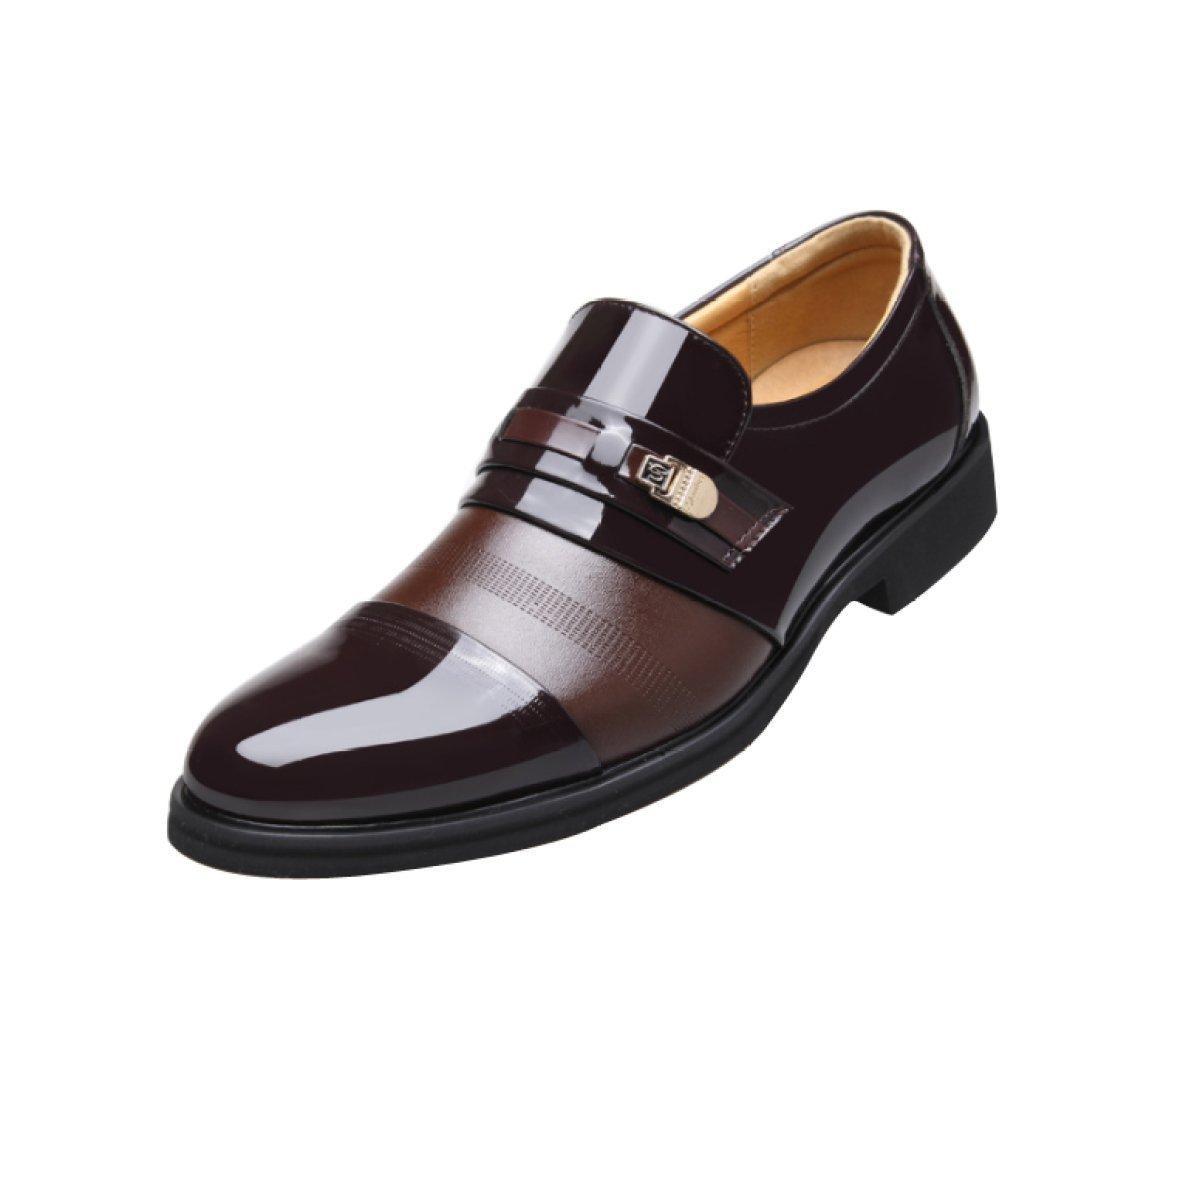 GTYMFH Spitz Männer Geschäft Anzüge Lässig Spitz GTYMFH Schuhe 8247ed